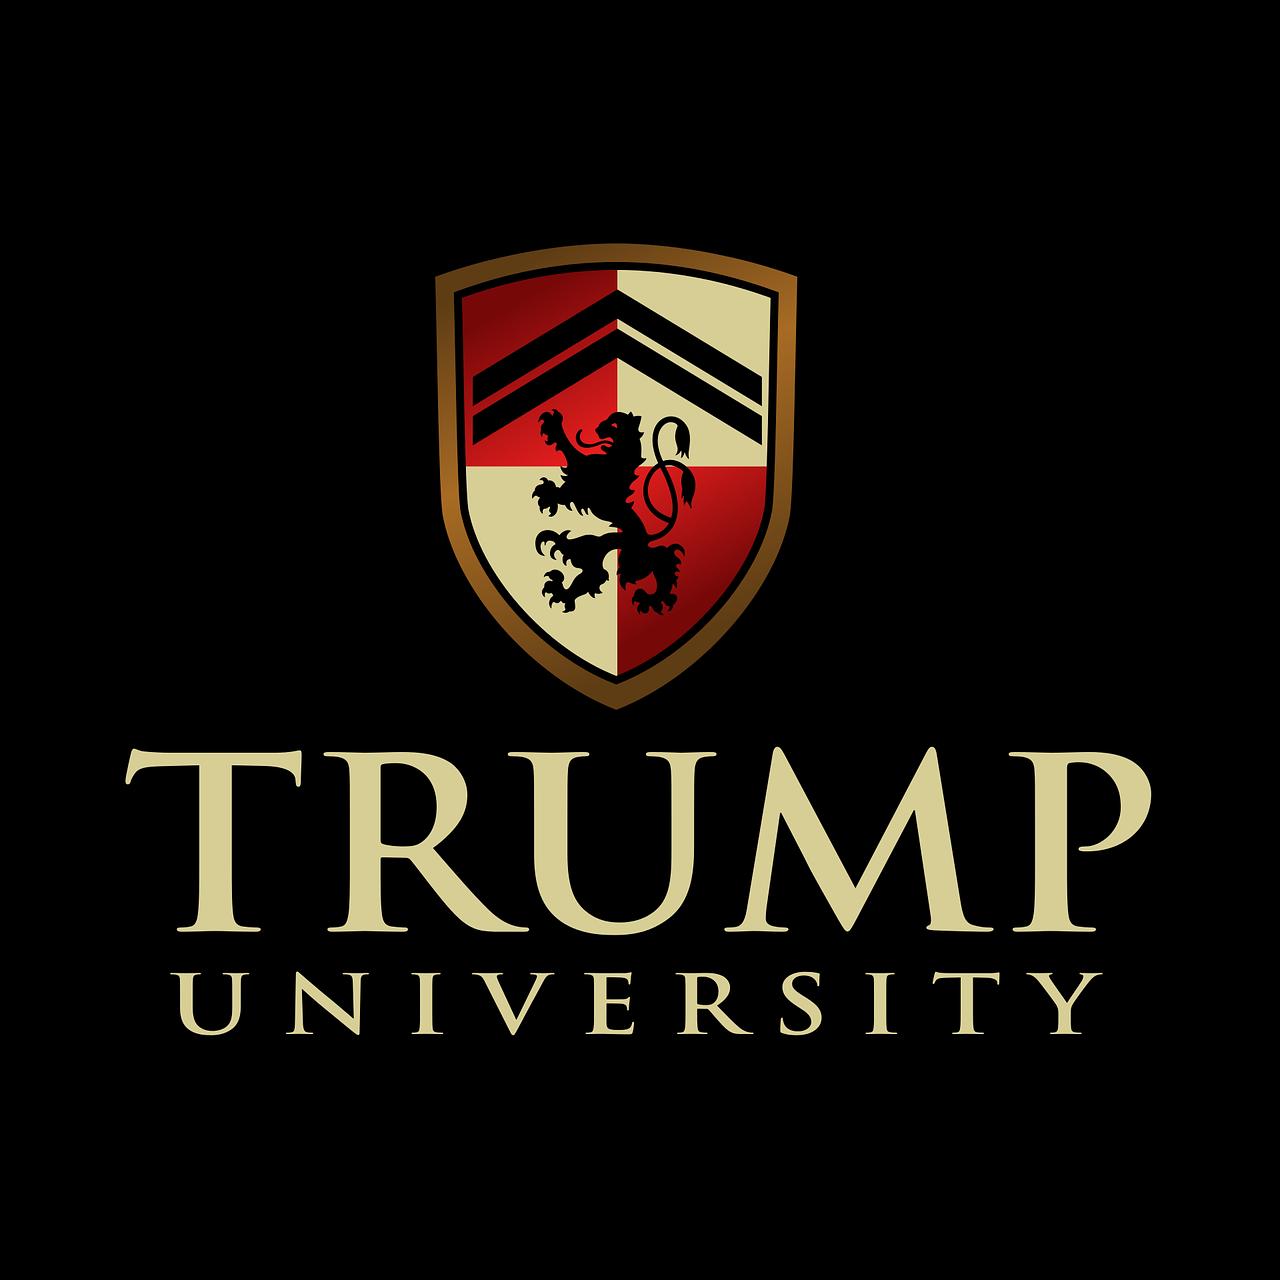 Trump University logo